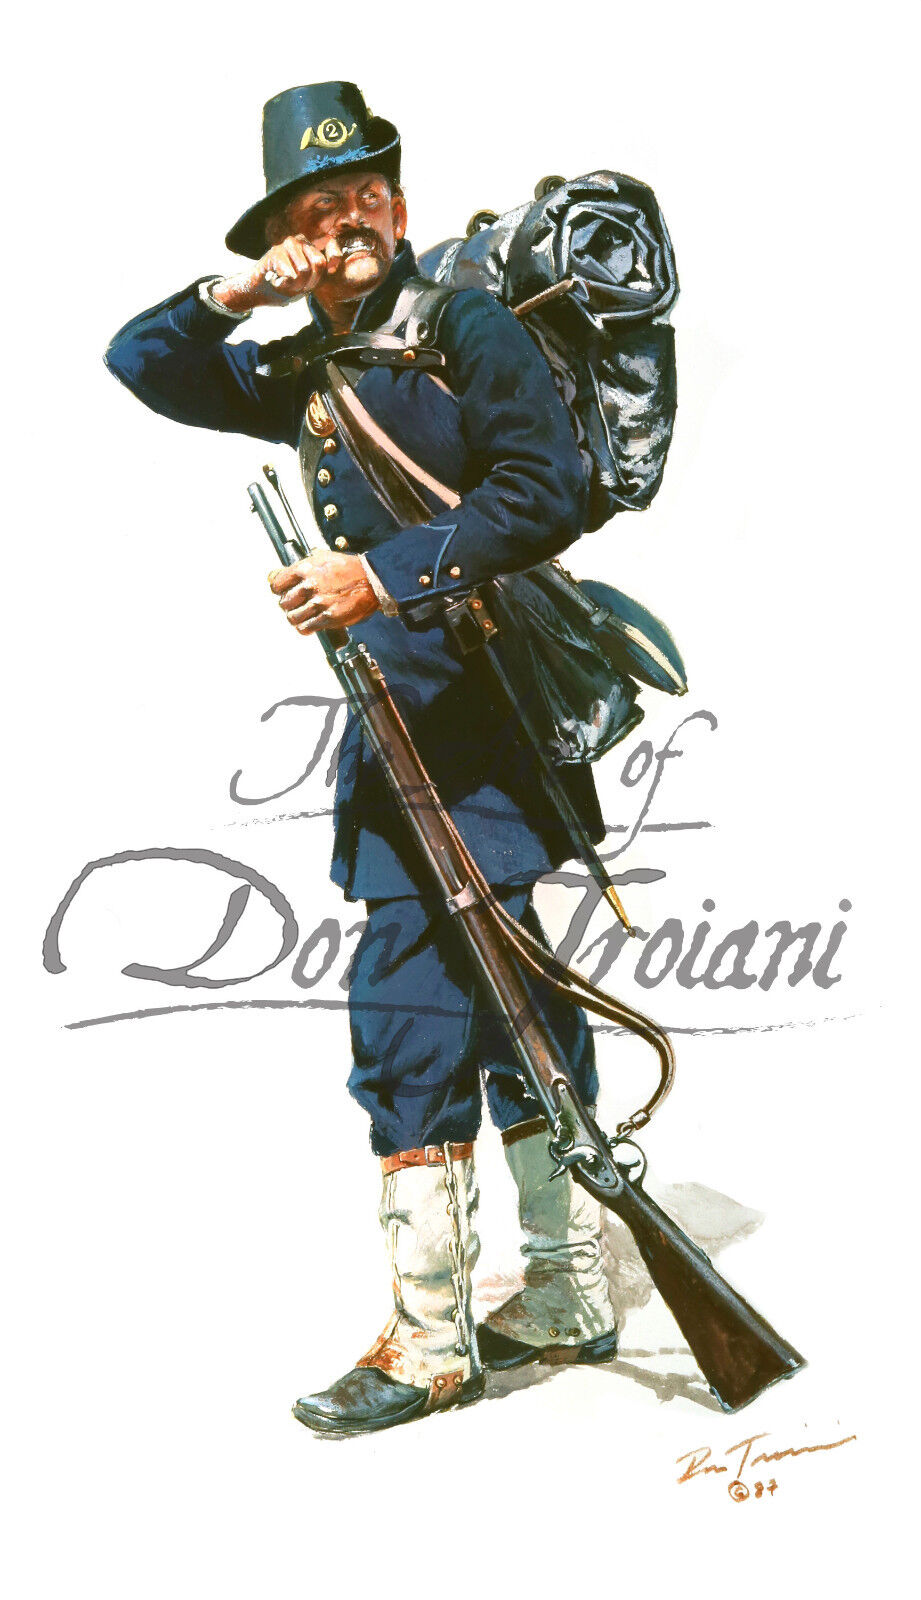 "1864/""-Don Troiani Petersburg /""2nd Connecticut Heavy Artillery"